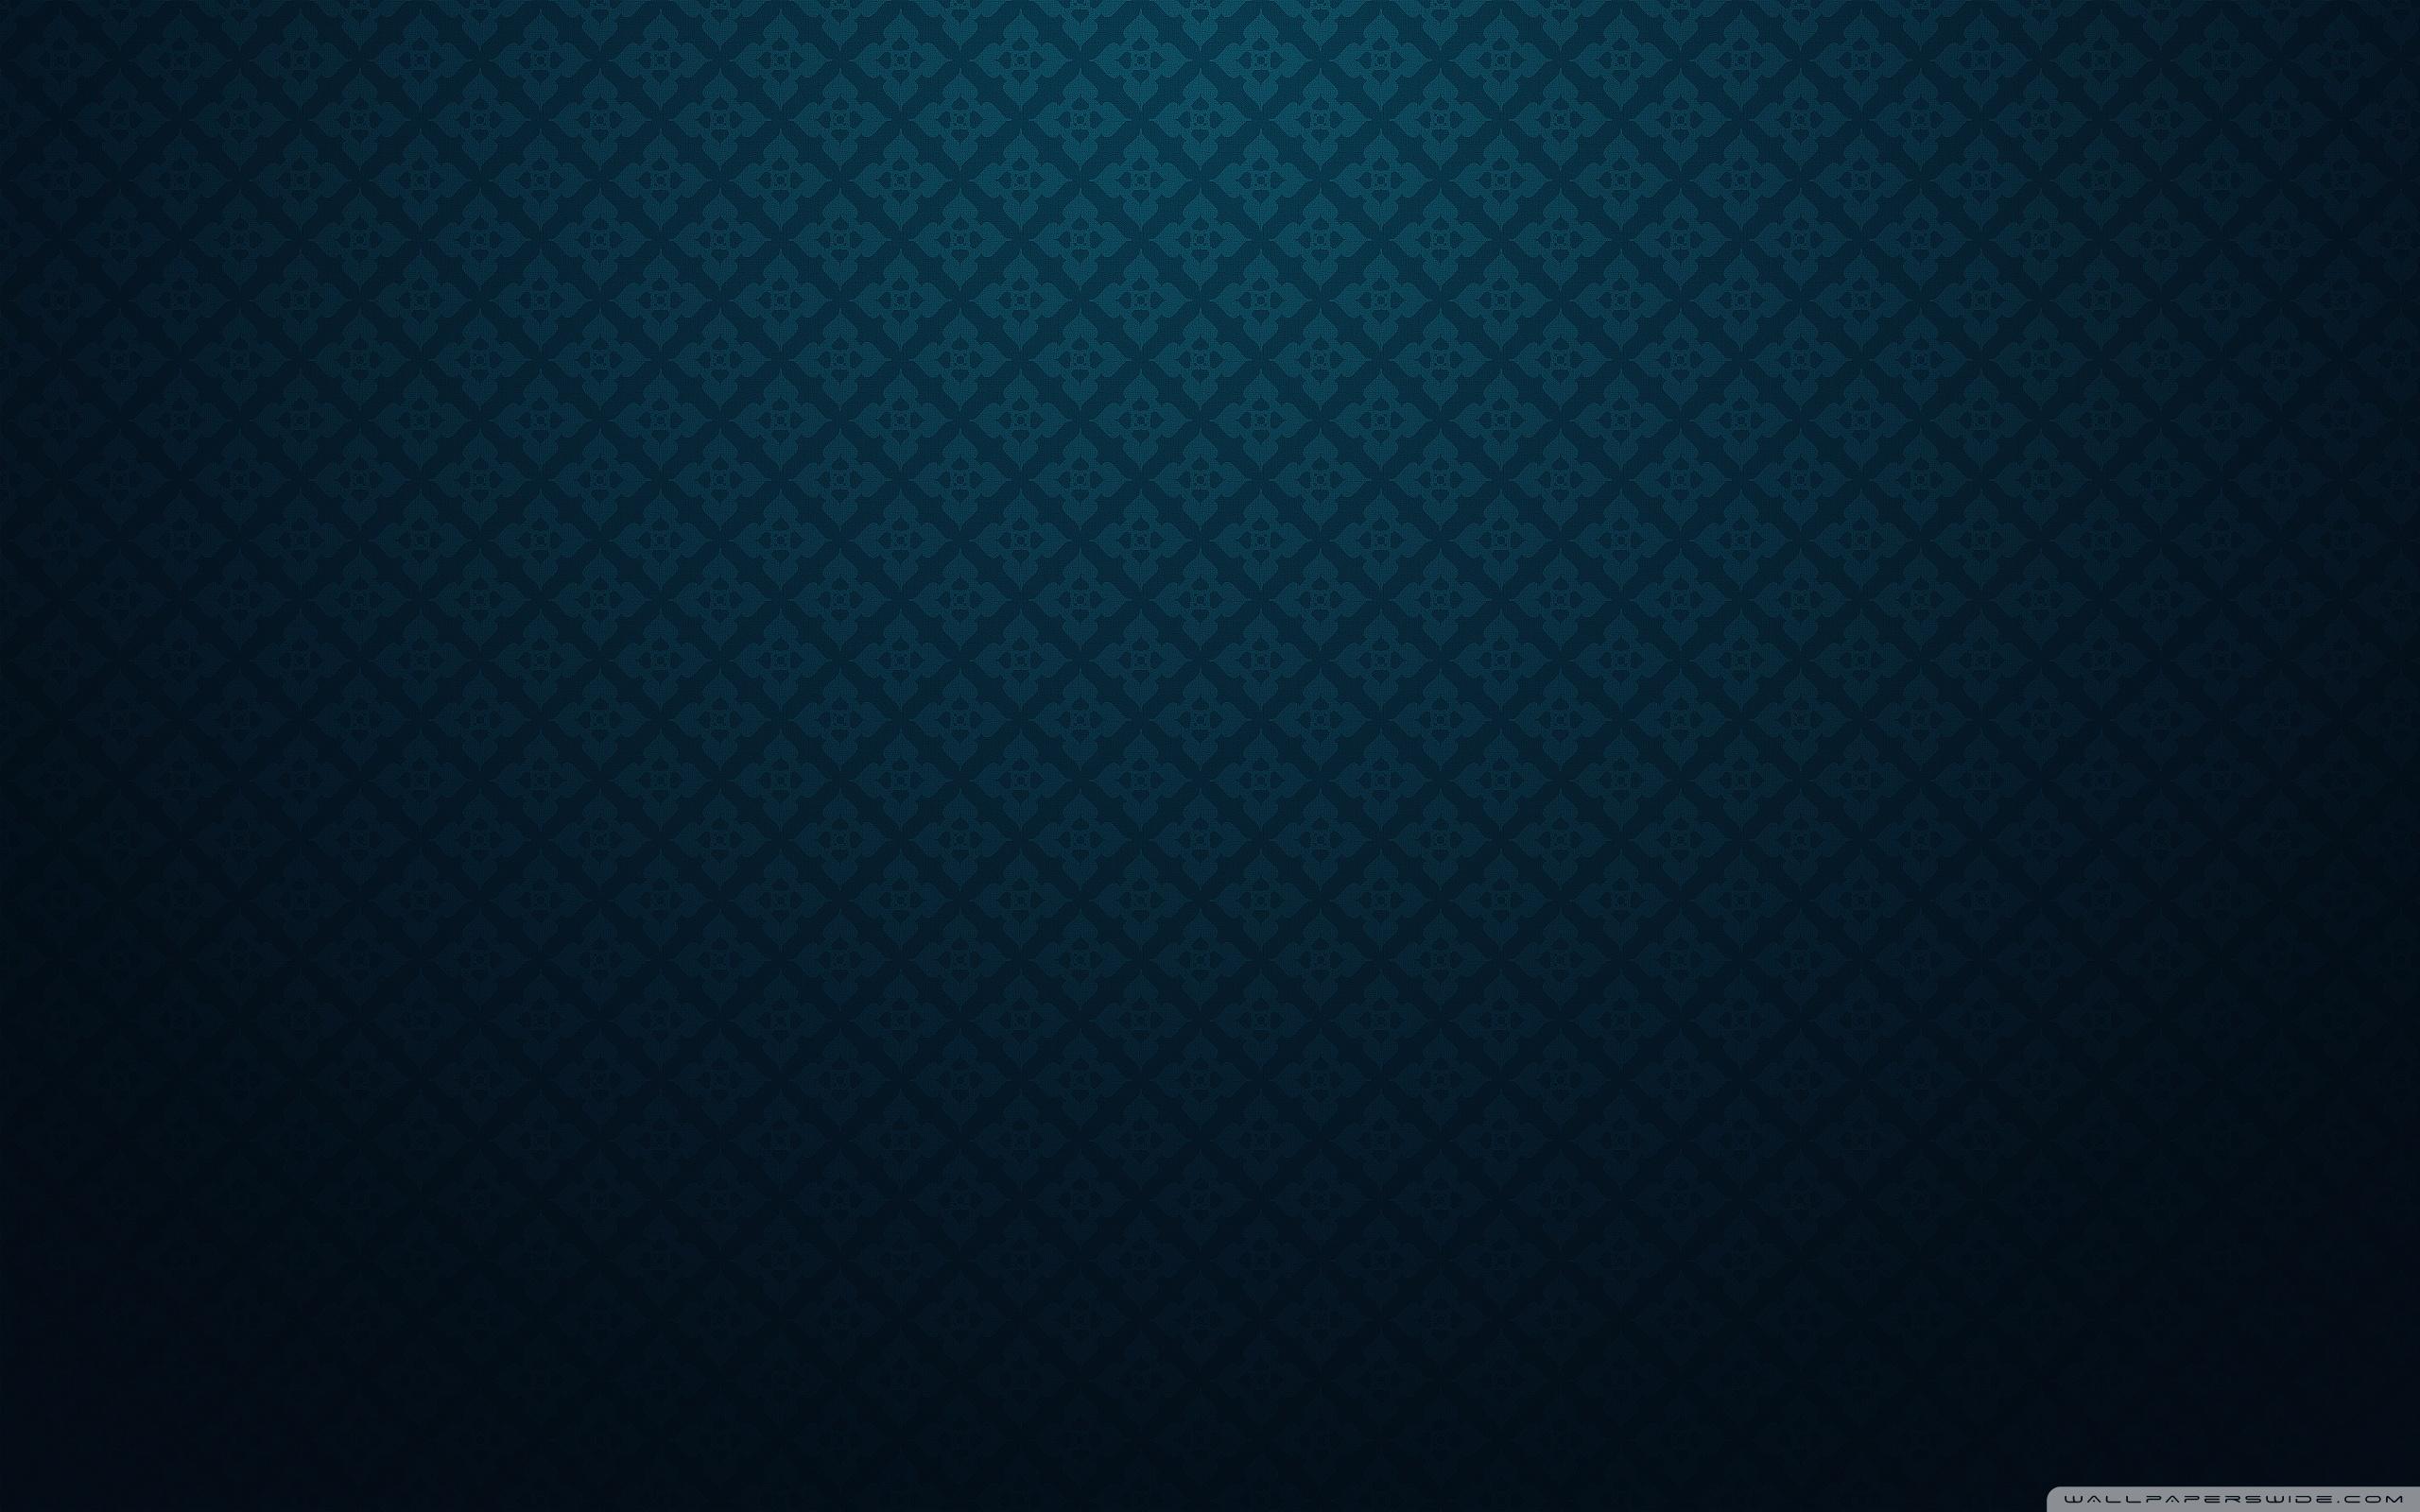 Simple S Wallpaper 2560x1600 57806